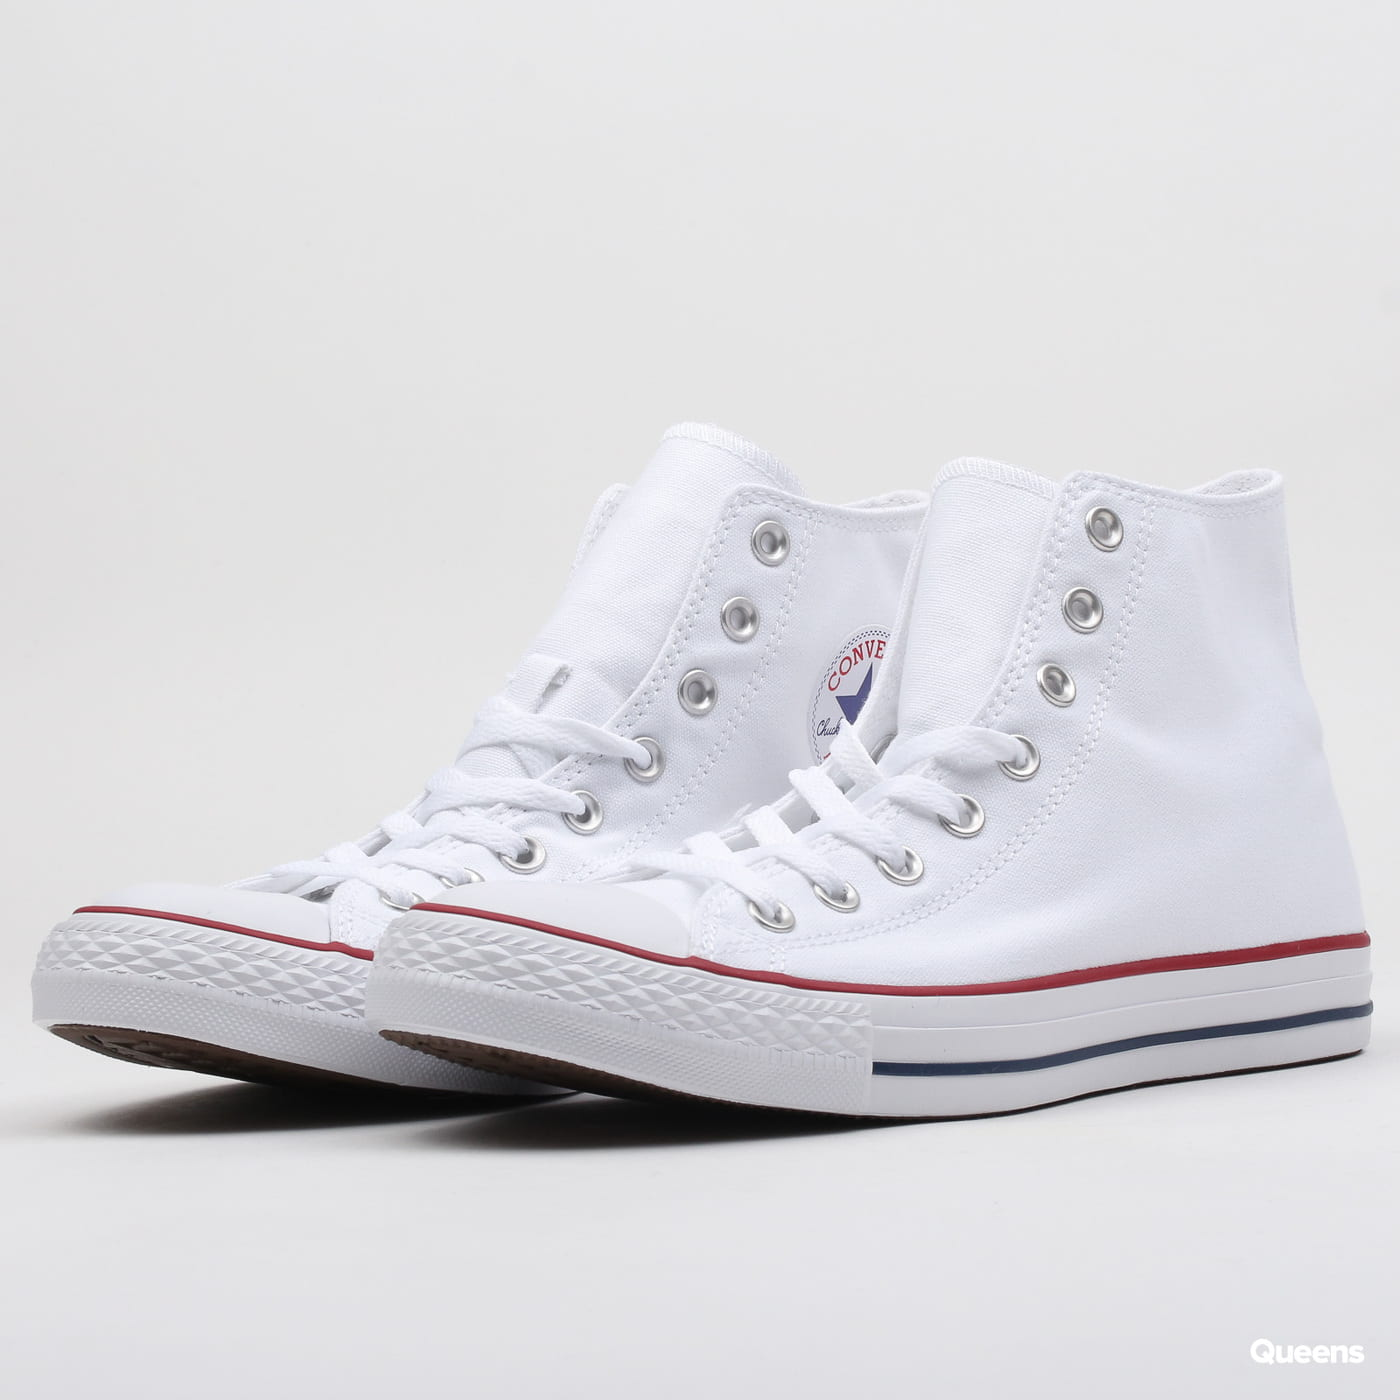 Converse Chuck Taylor All Star Hi optic white